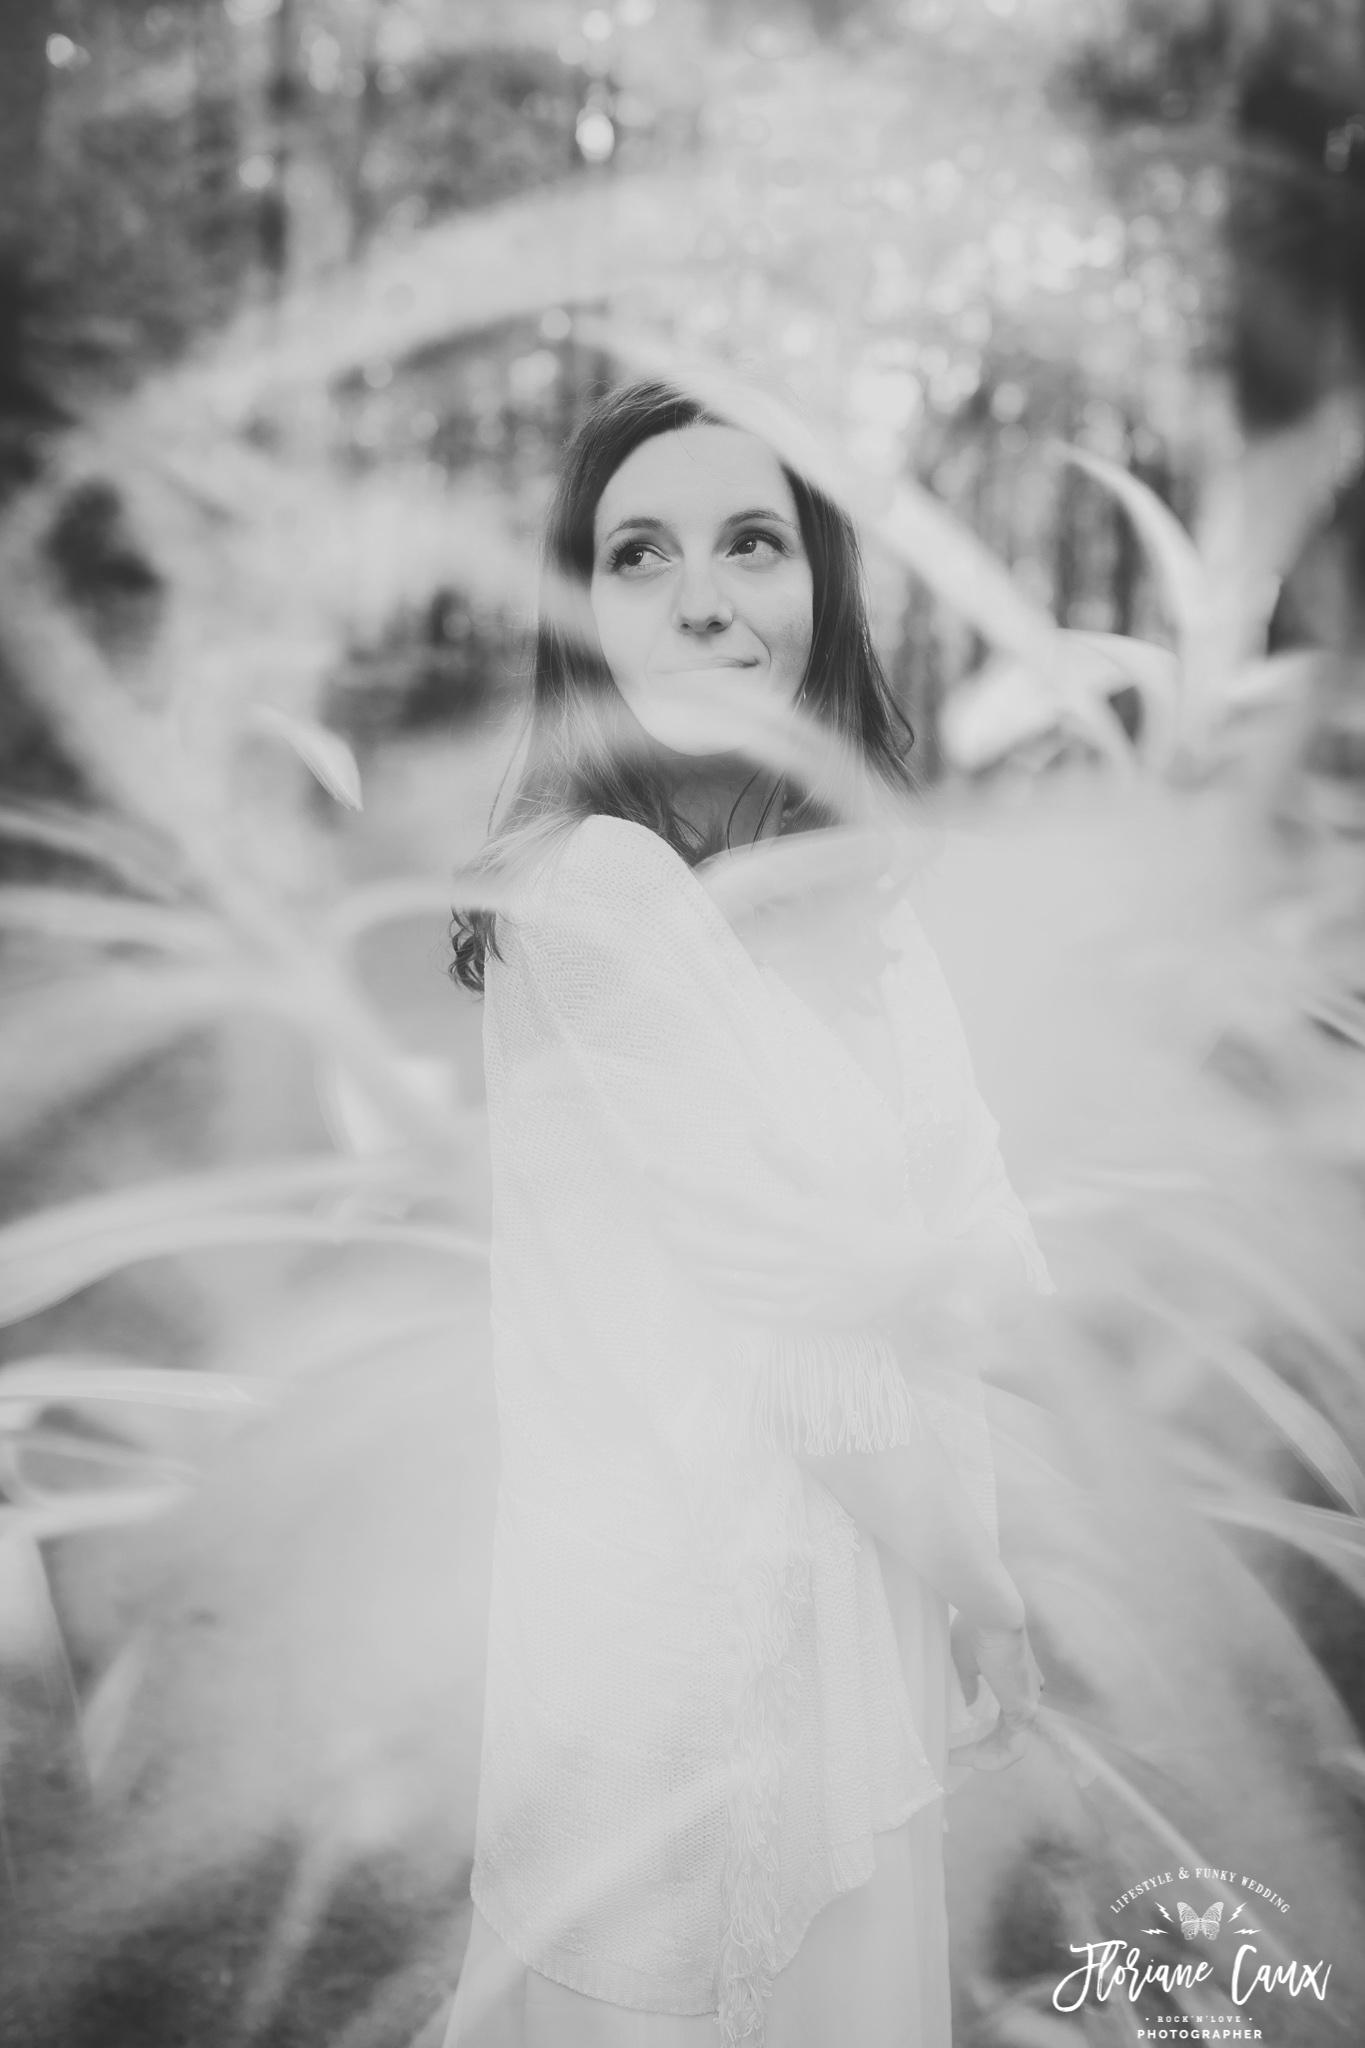 destination-wedding-photographer-oslo-norway-floriane-caux-81